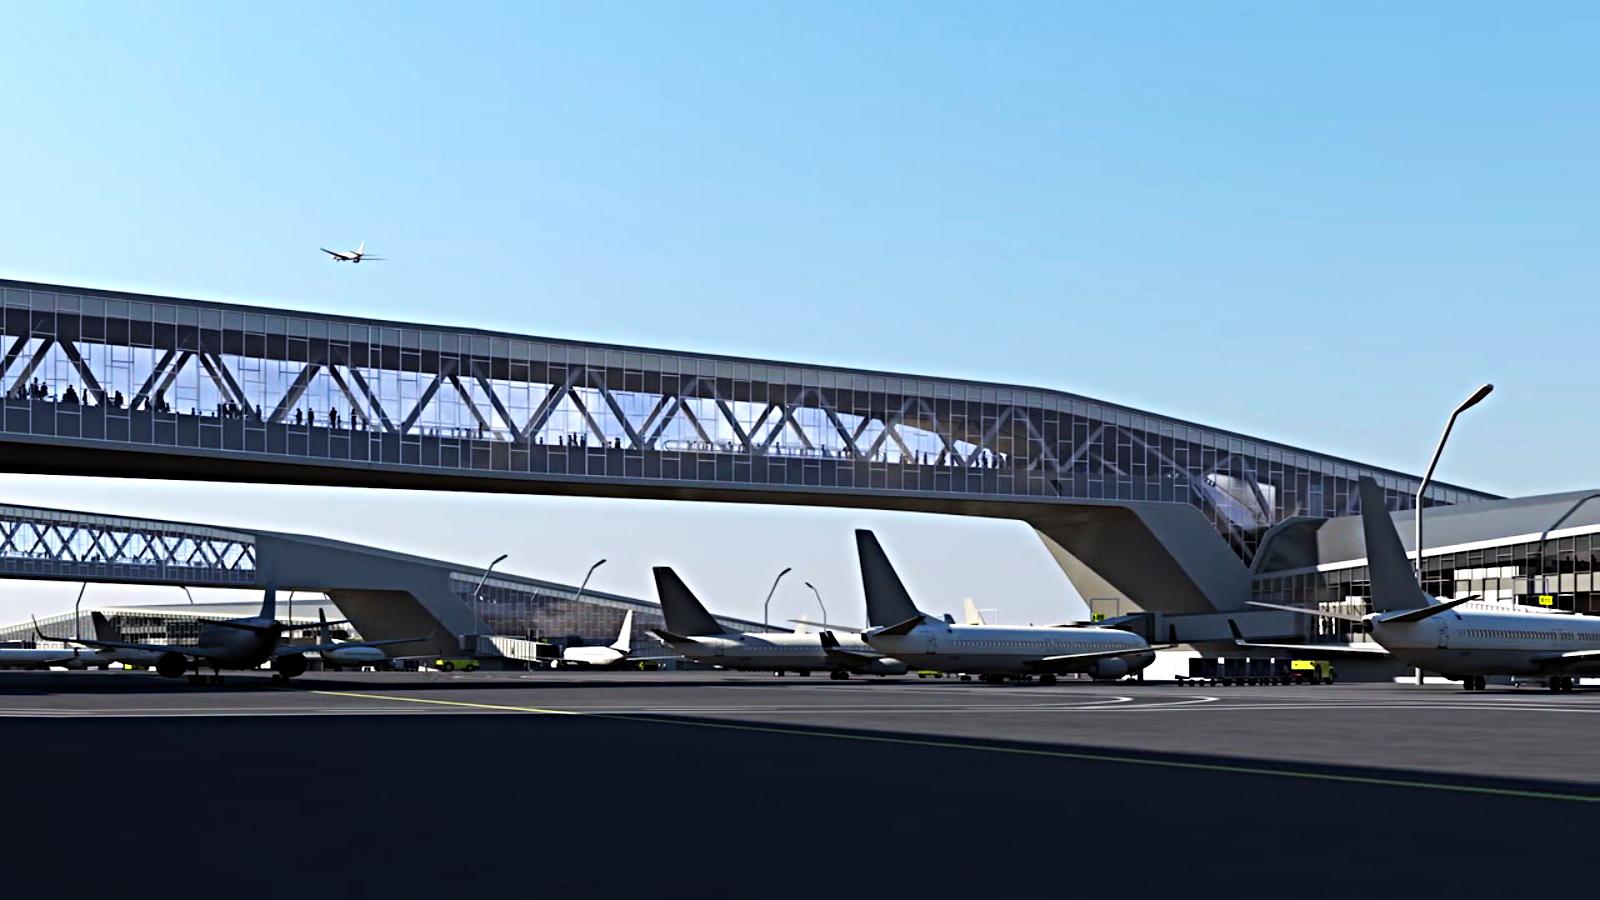 New York City: A brand new LaGuardia Airport | Dilemma X